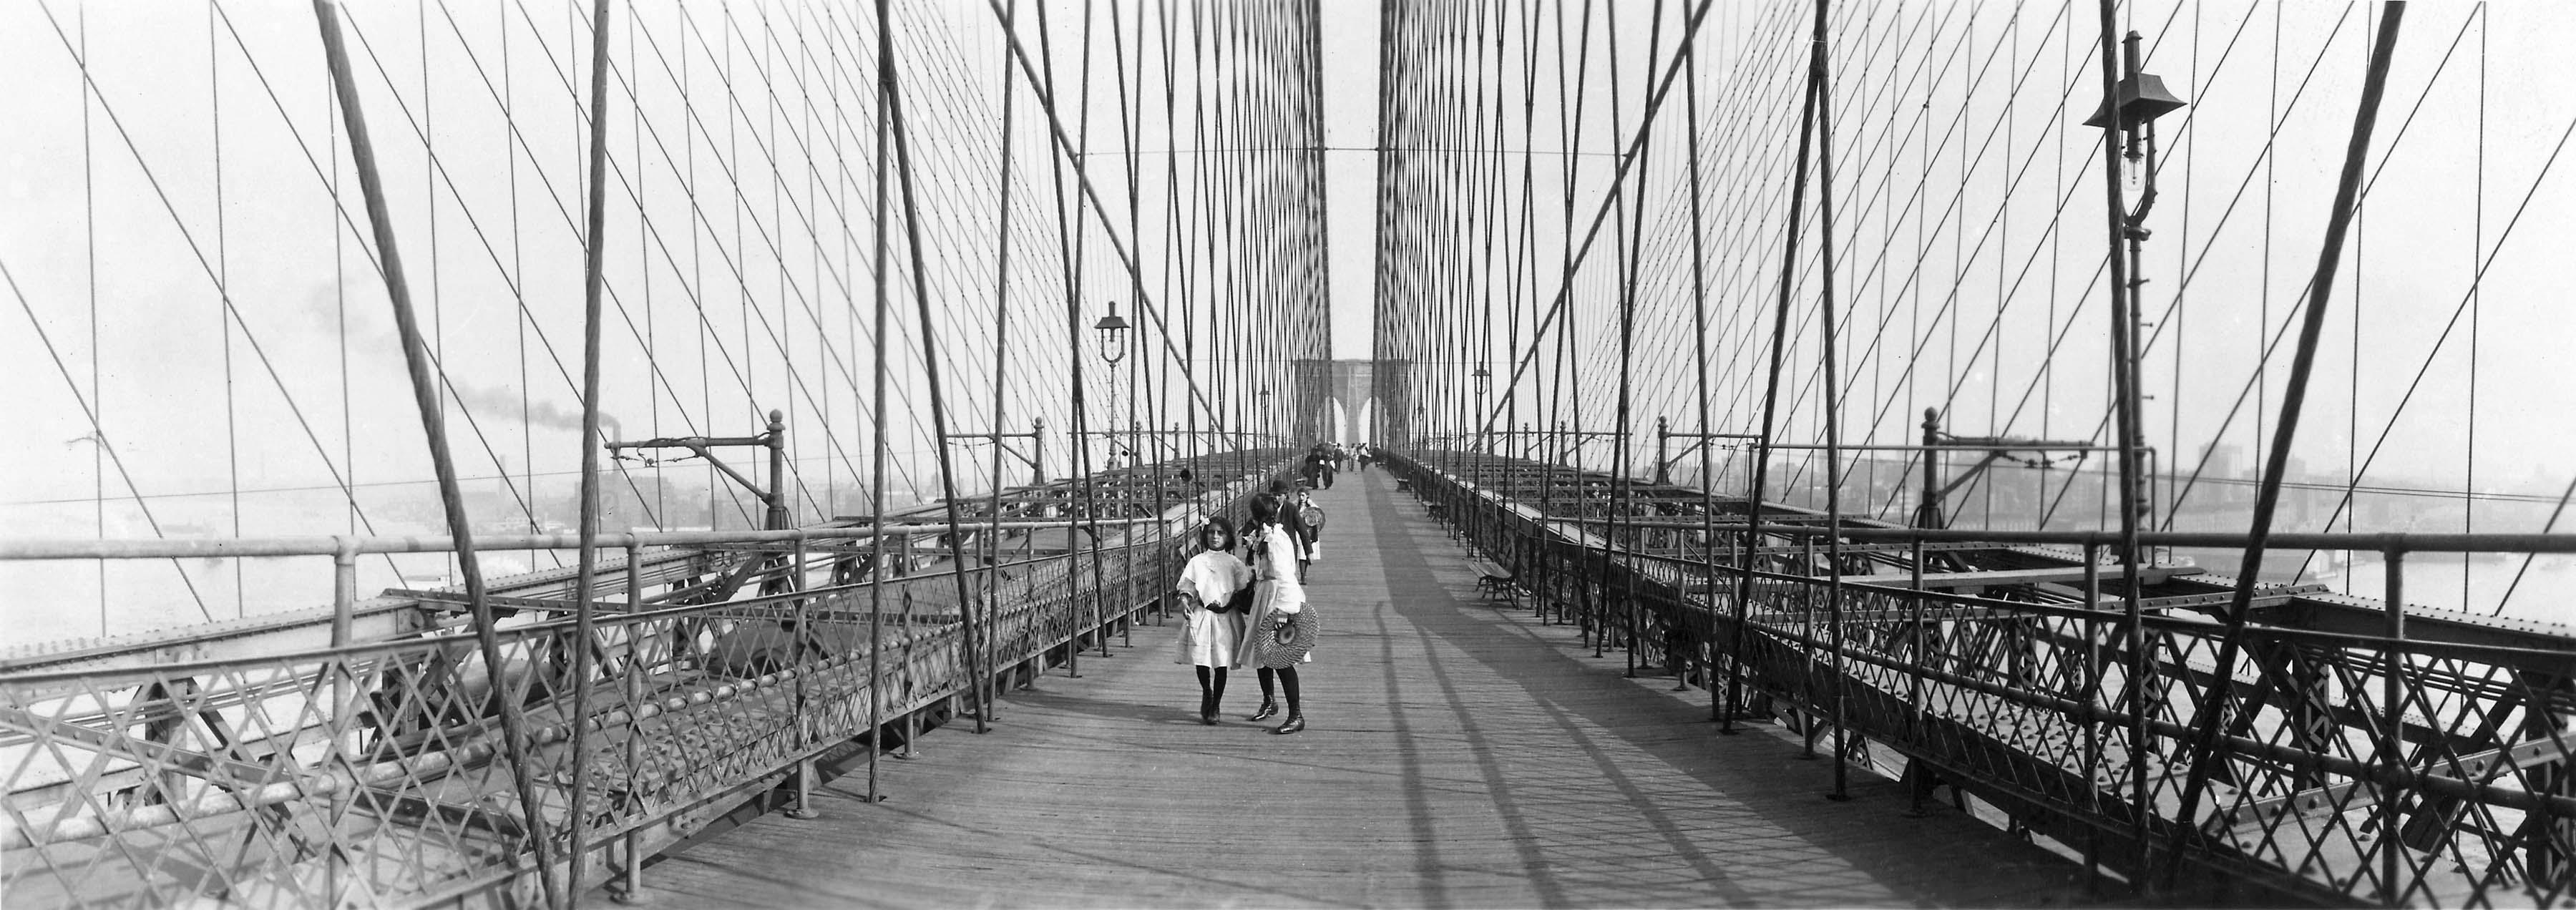 Pedestrians on the Brooklyn Bridge, ca. 1910